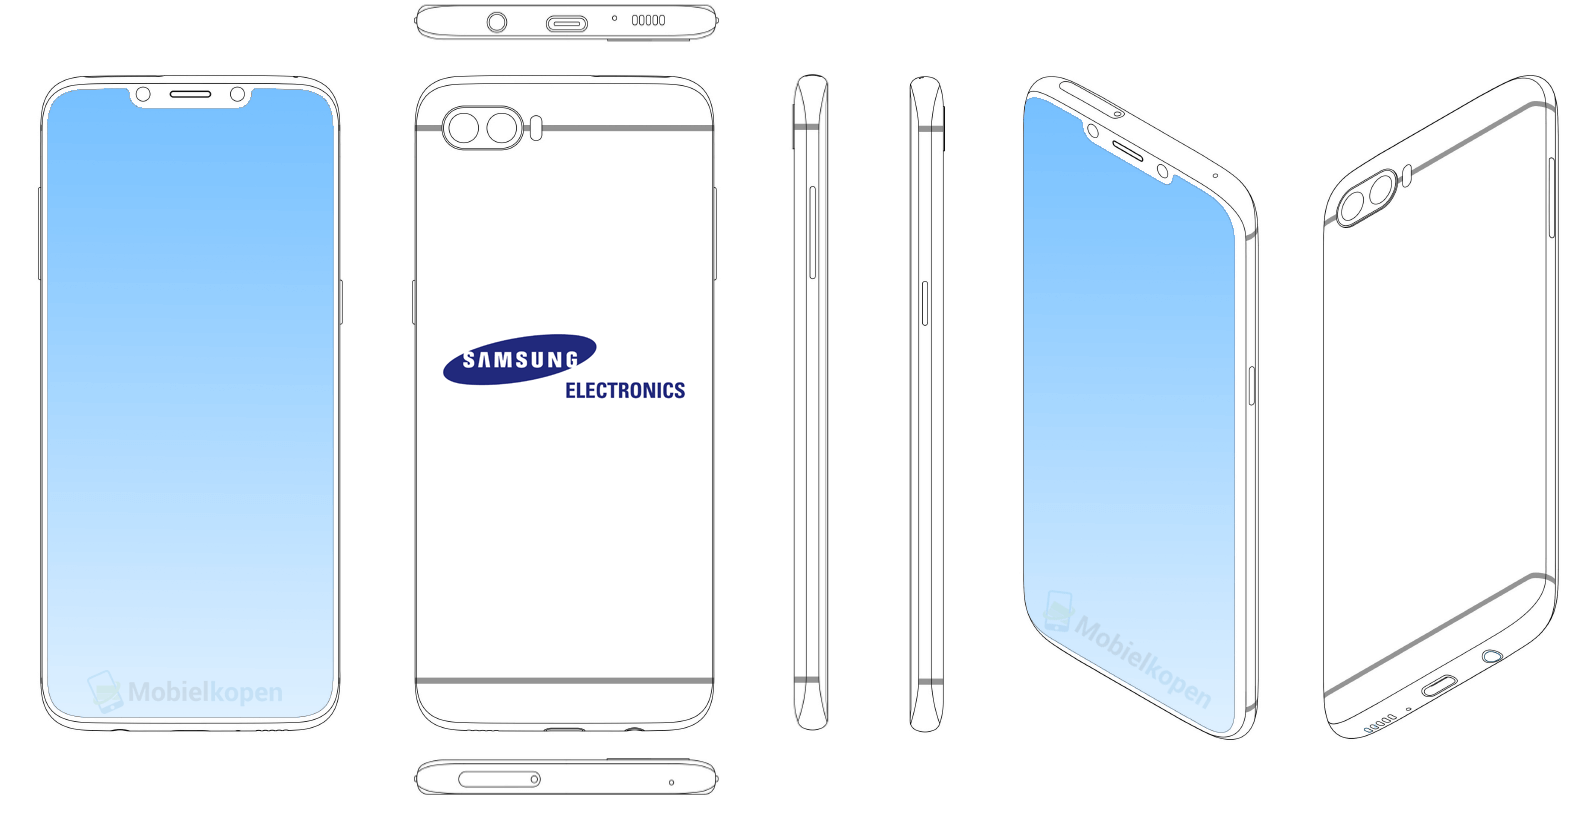 Samsung col notch